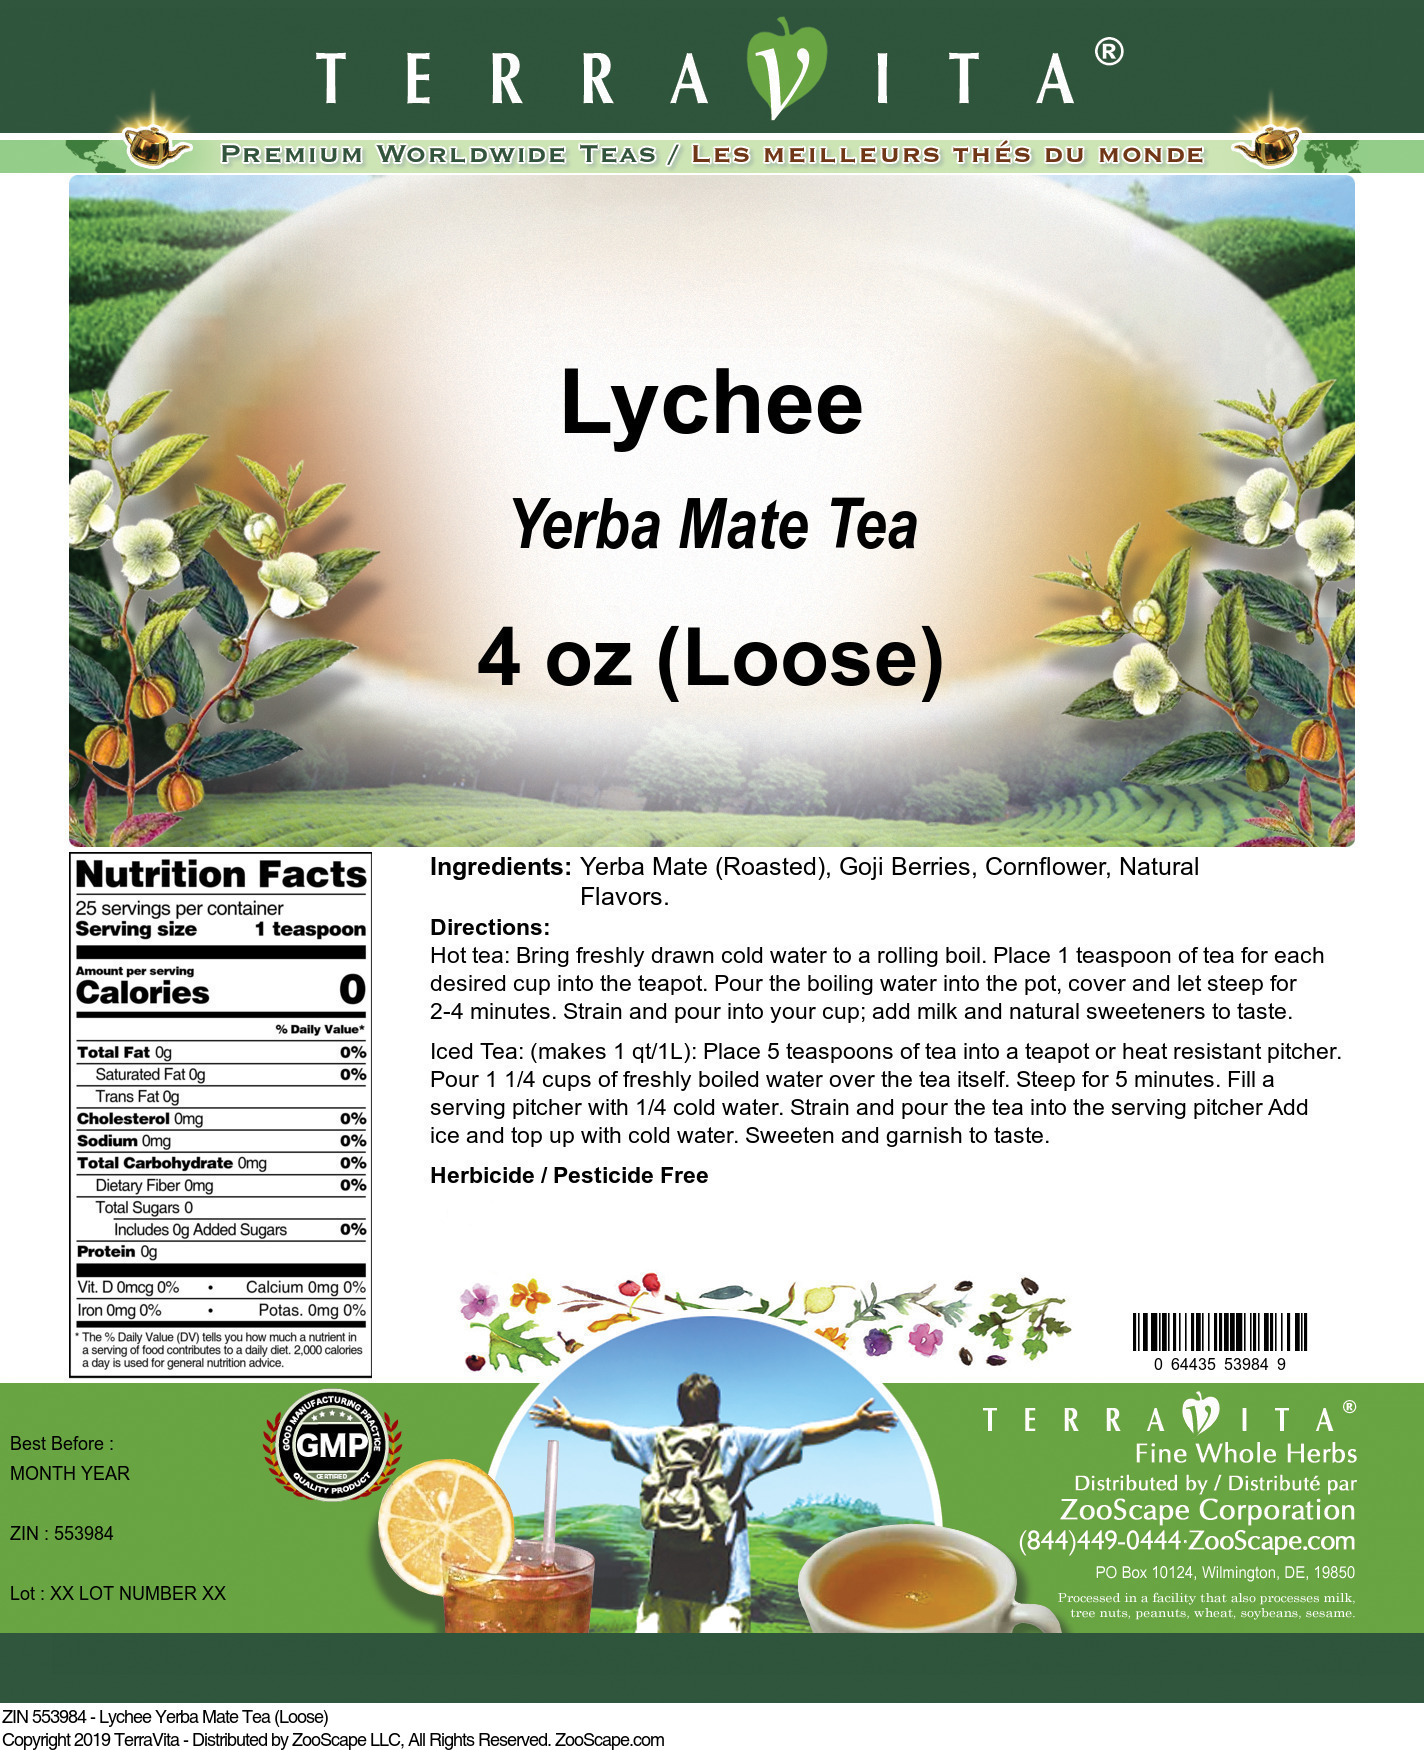 Lychee Yerba Mate Tea (Loose)